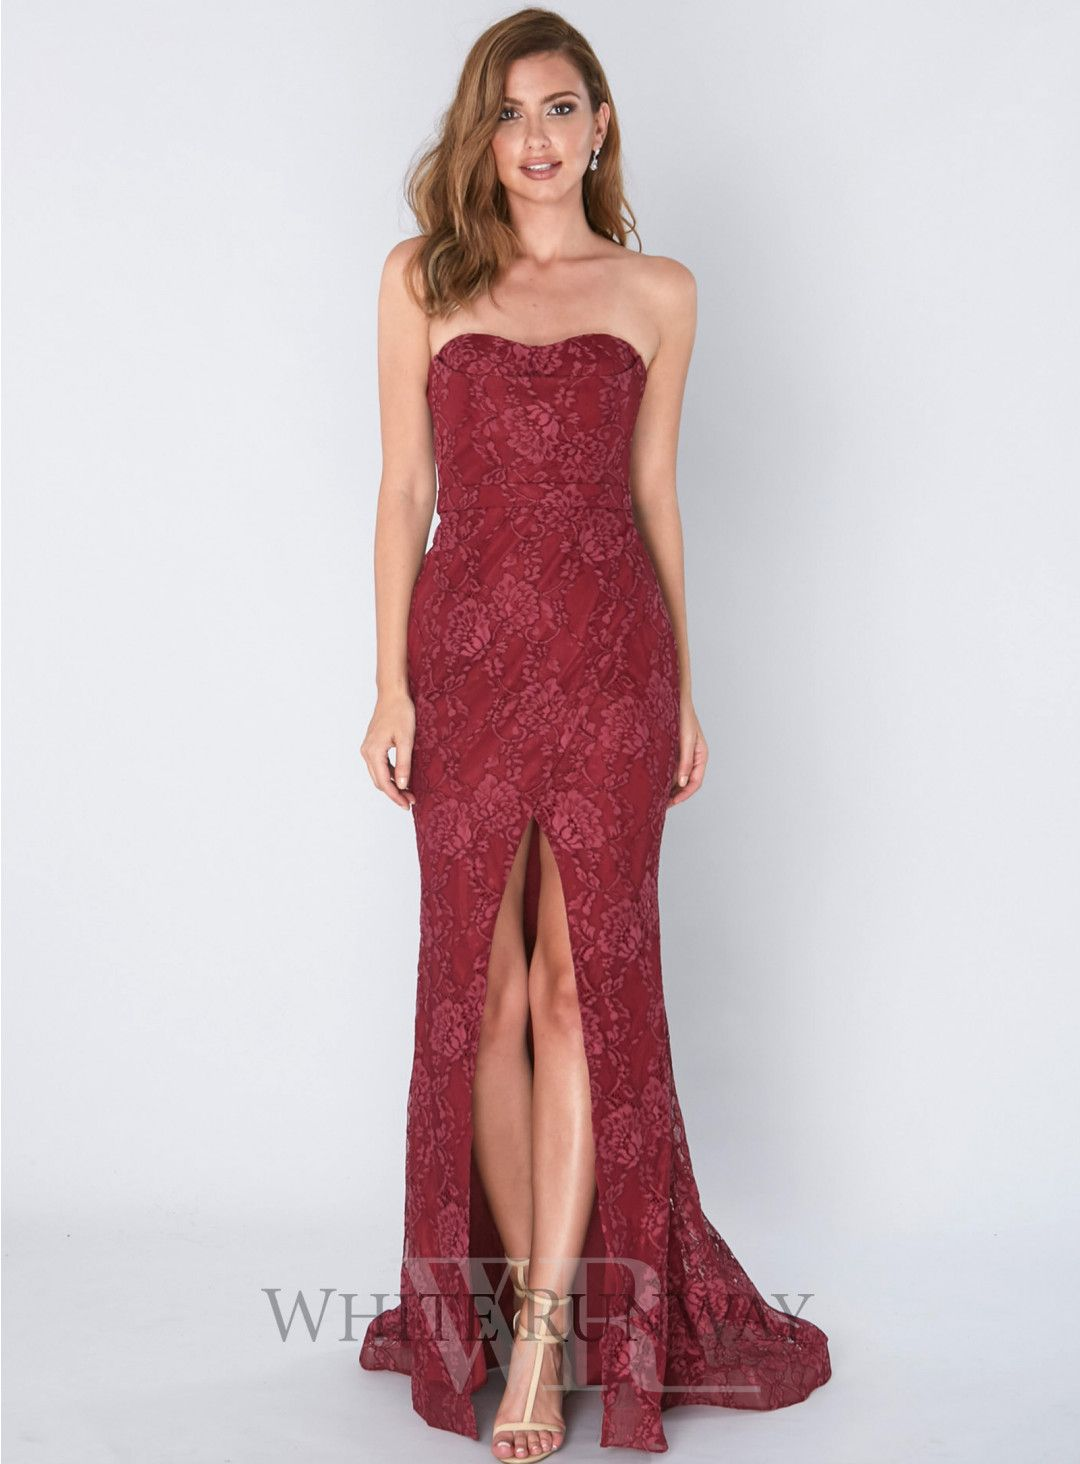 Our telullah dress red bridesmaids pinterest red bridesmaids